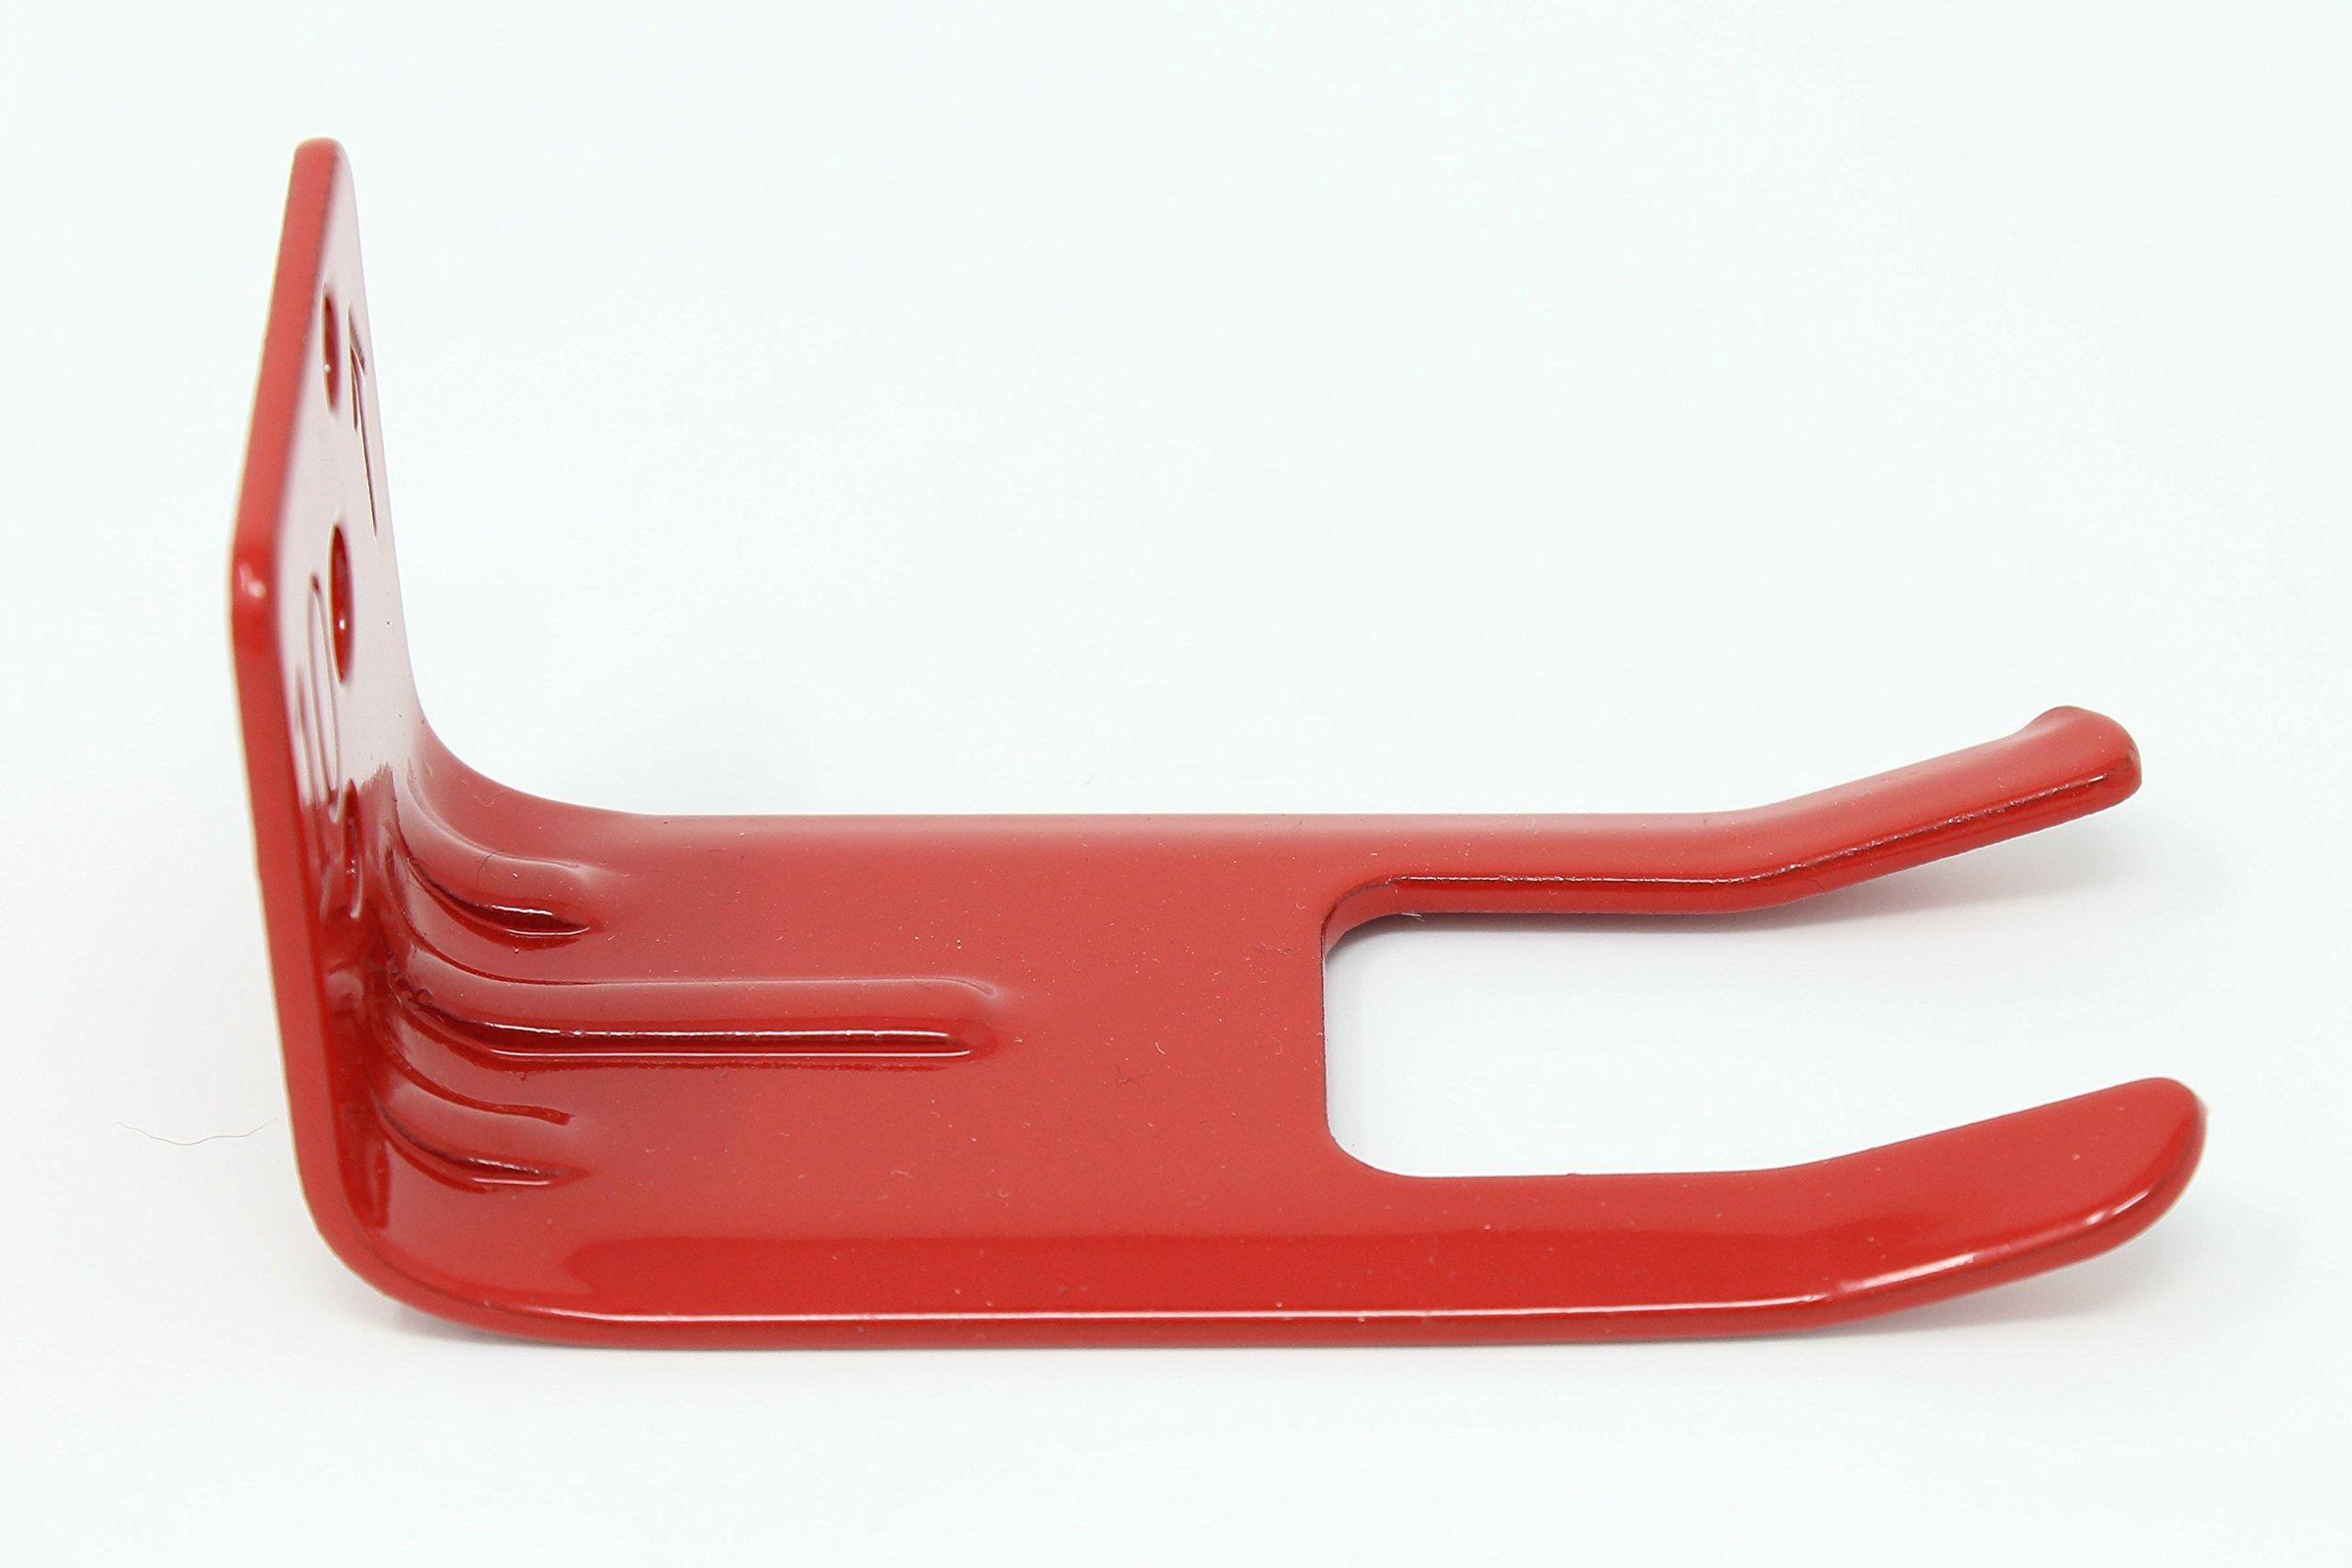 Fire Extinguisher Wall Mount - Fork Style Bracket (3, Large) by Extinguisher Experts (Image #4)